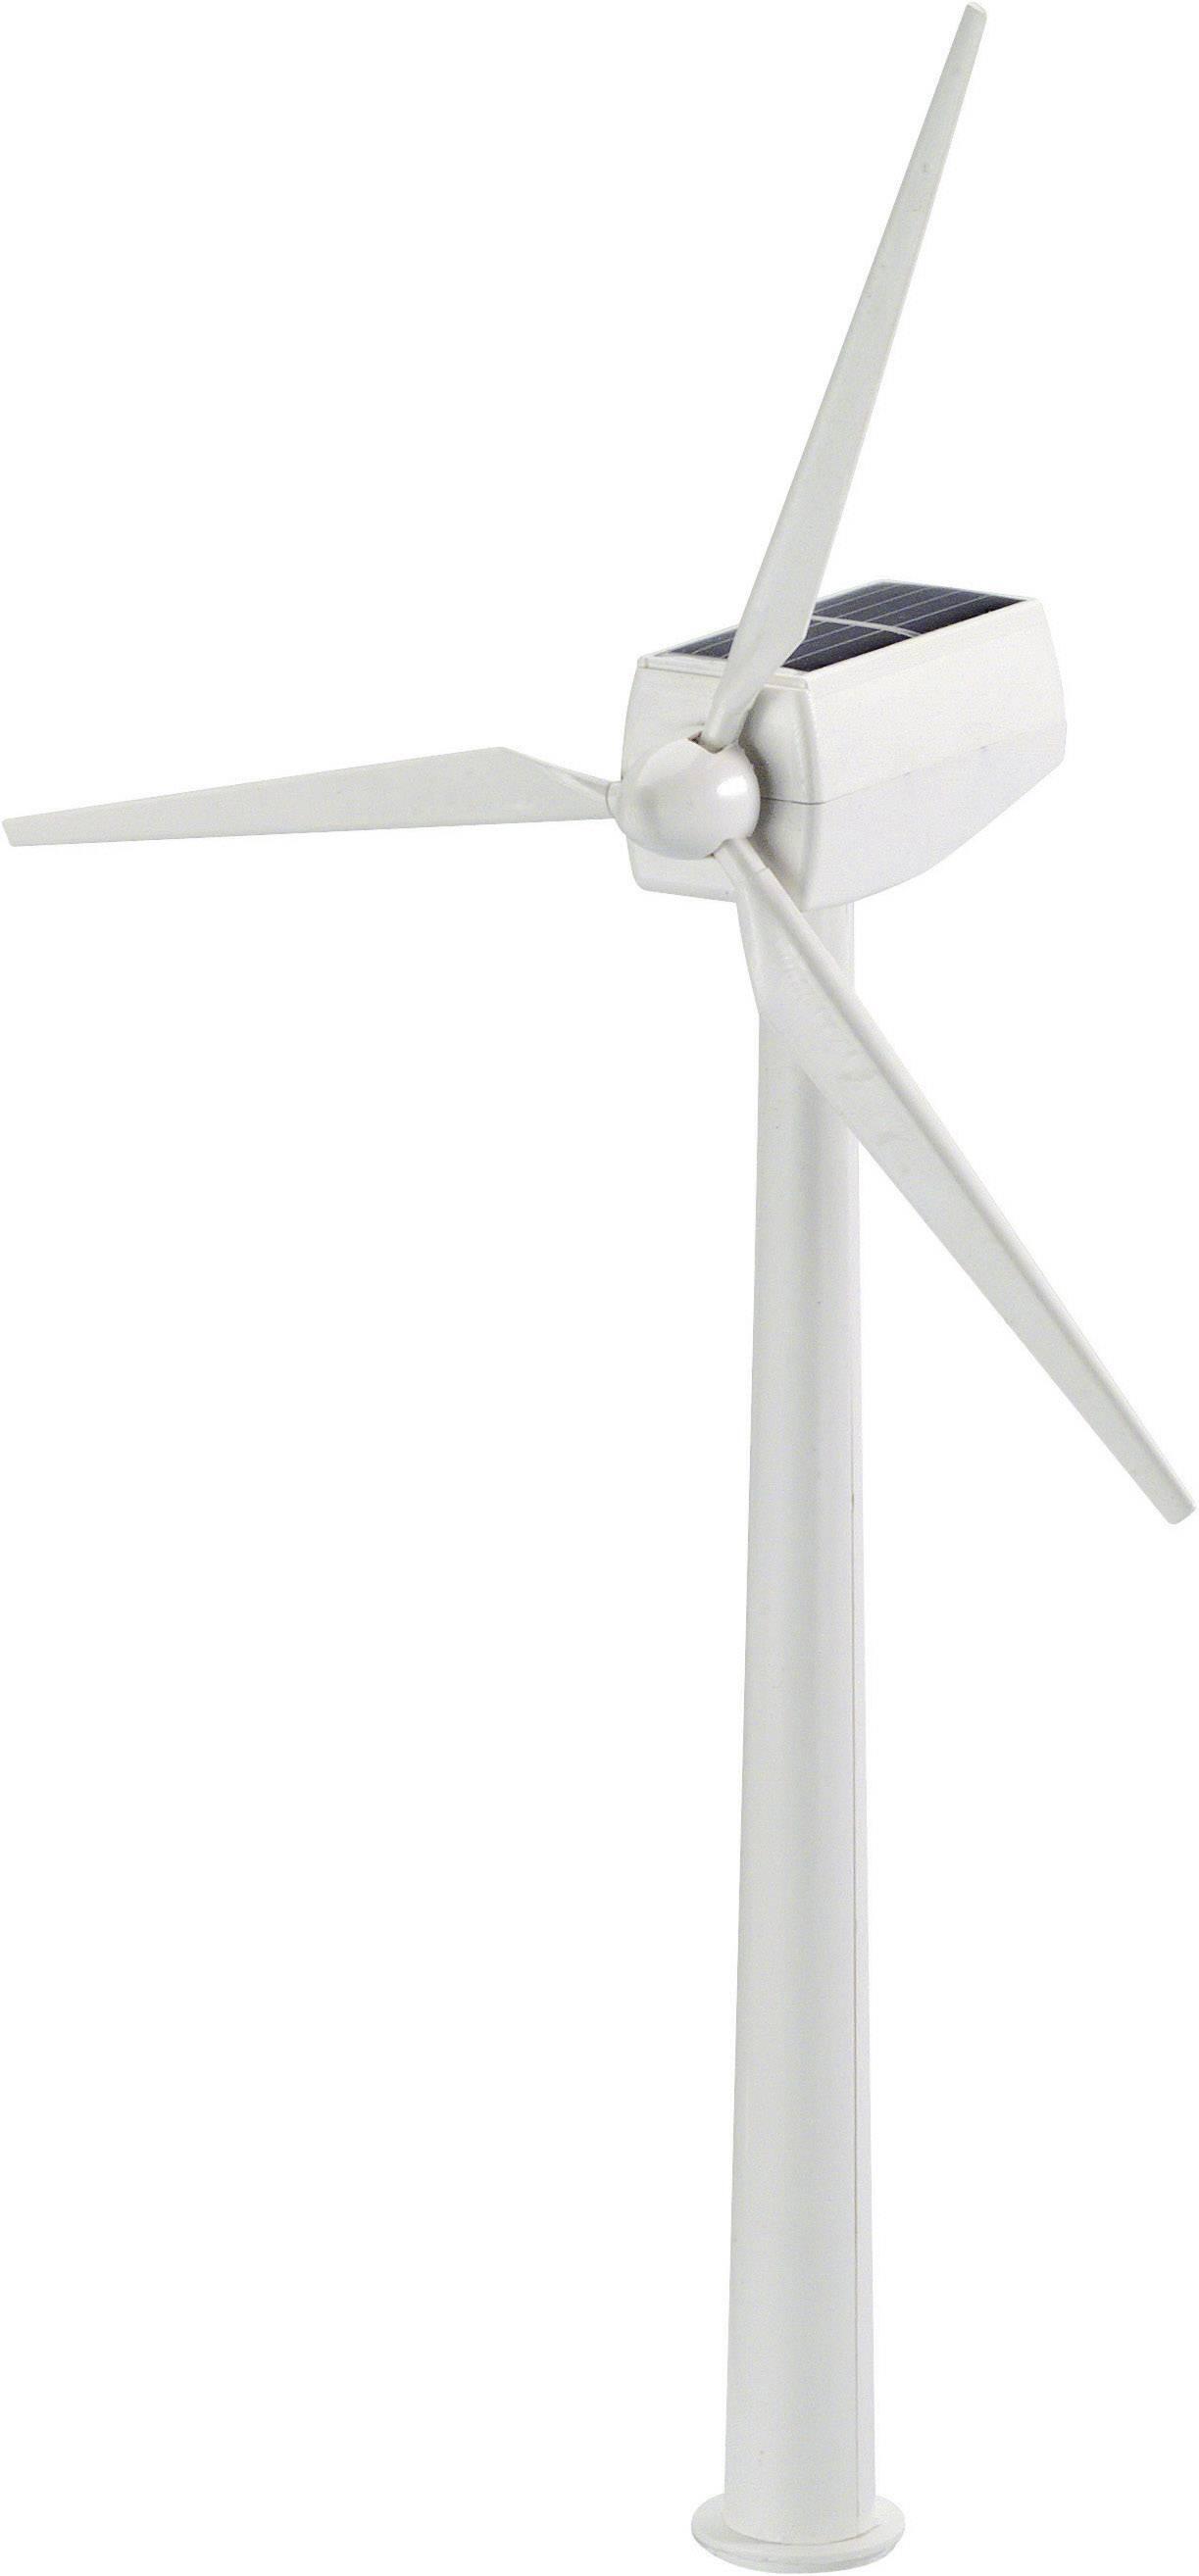 Stavebnice solární a větrné elektrárny H0